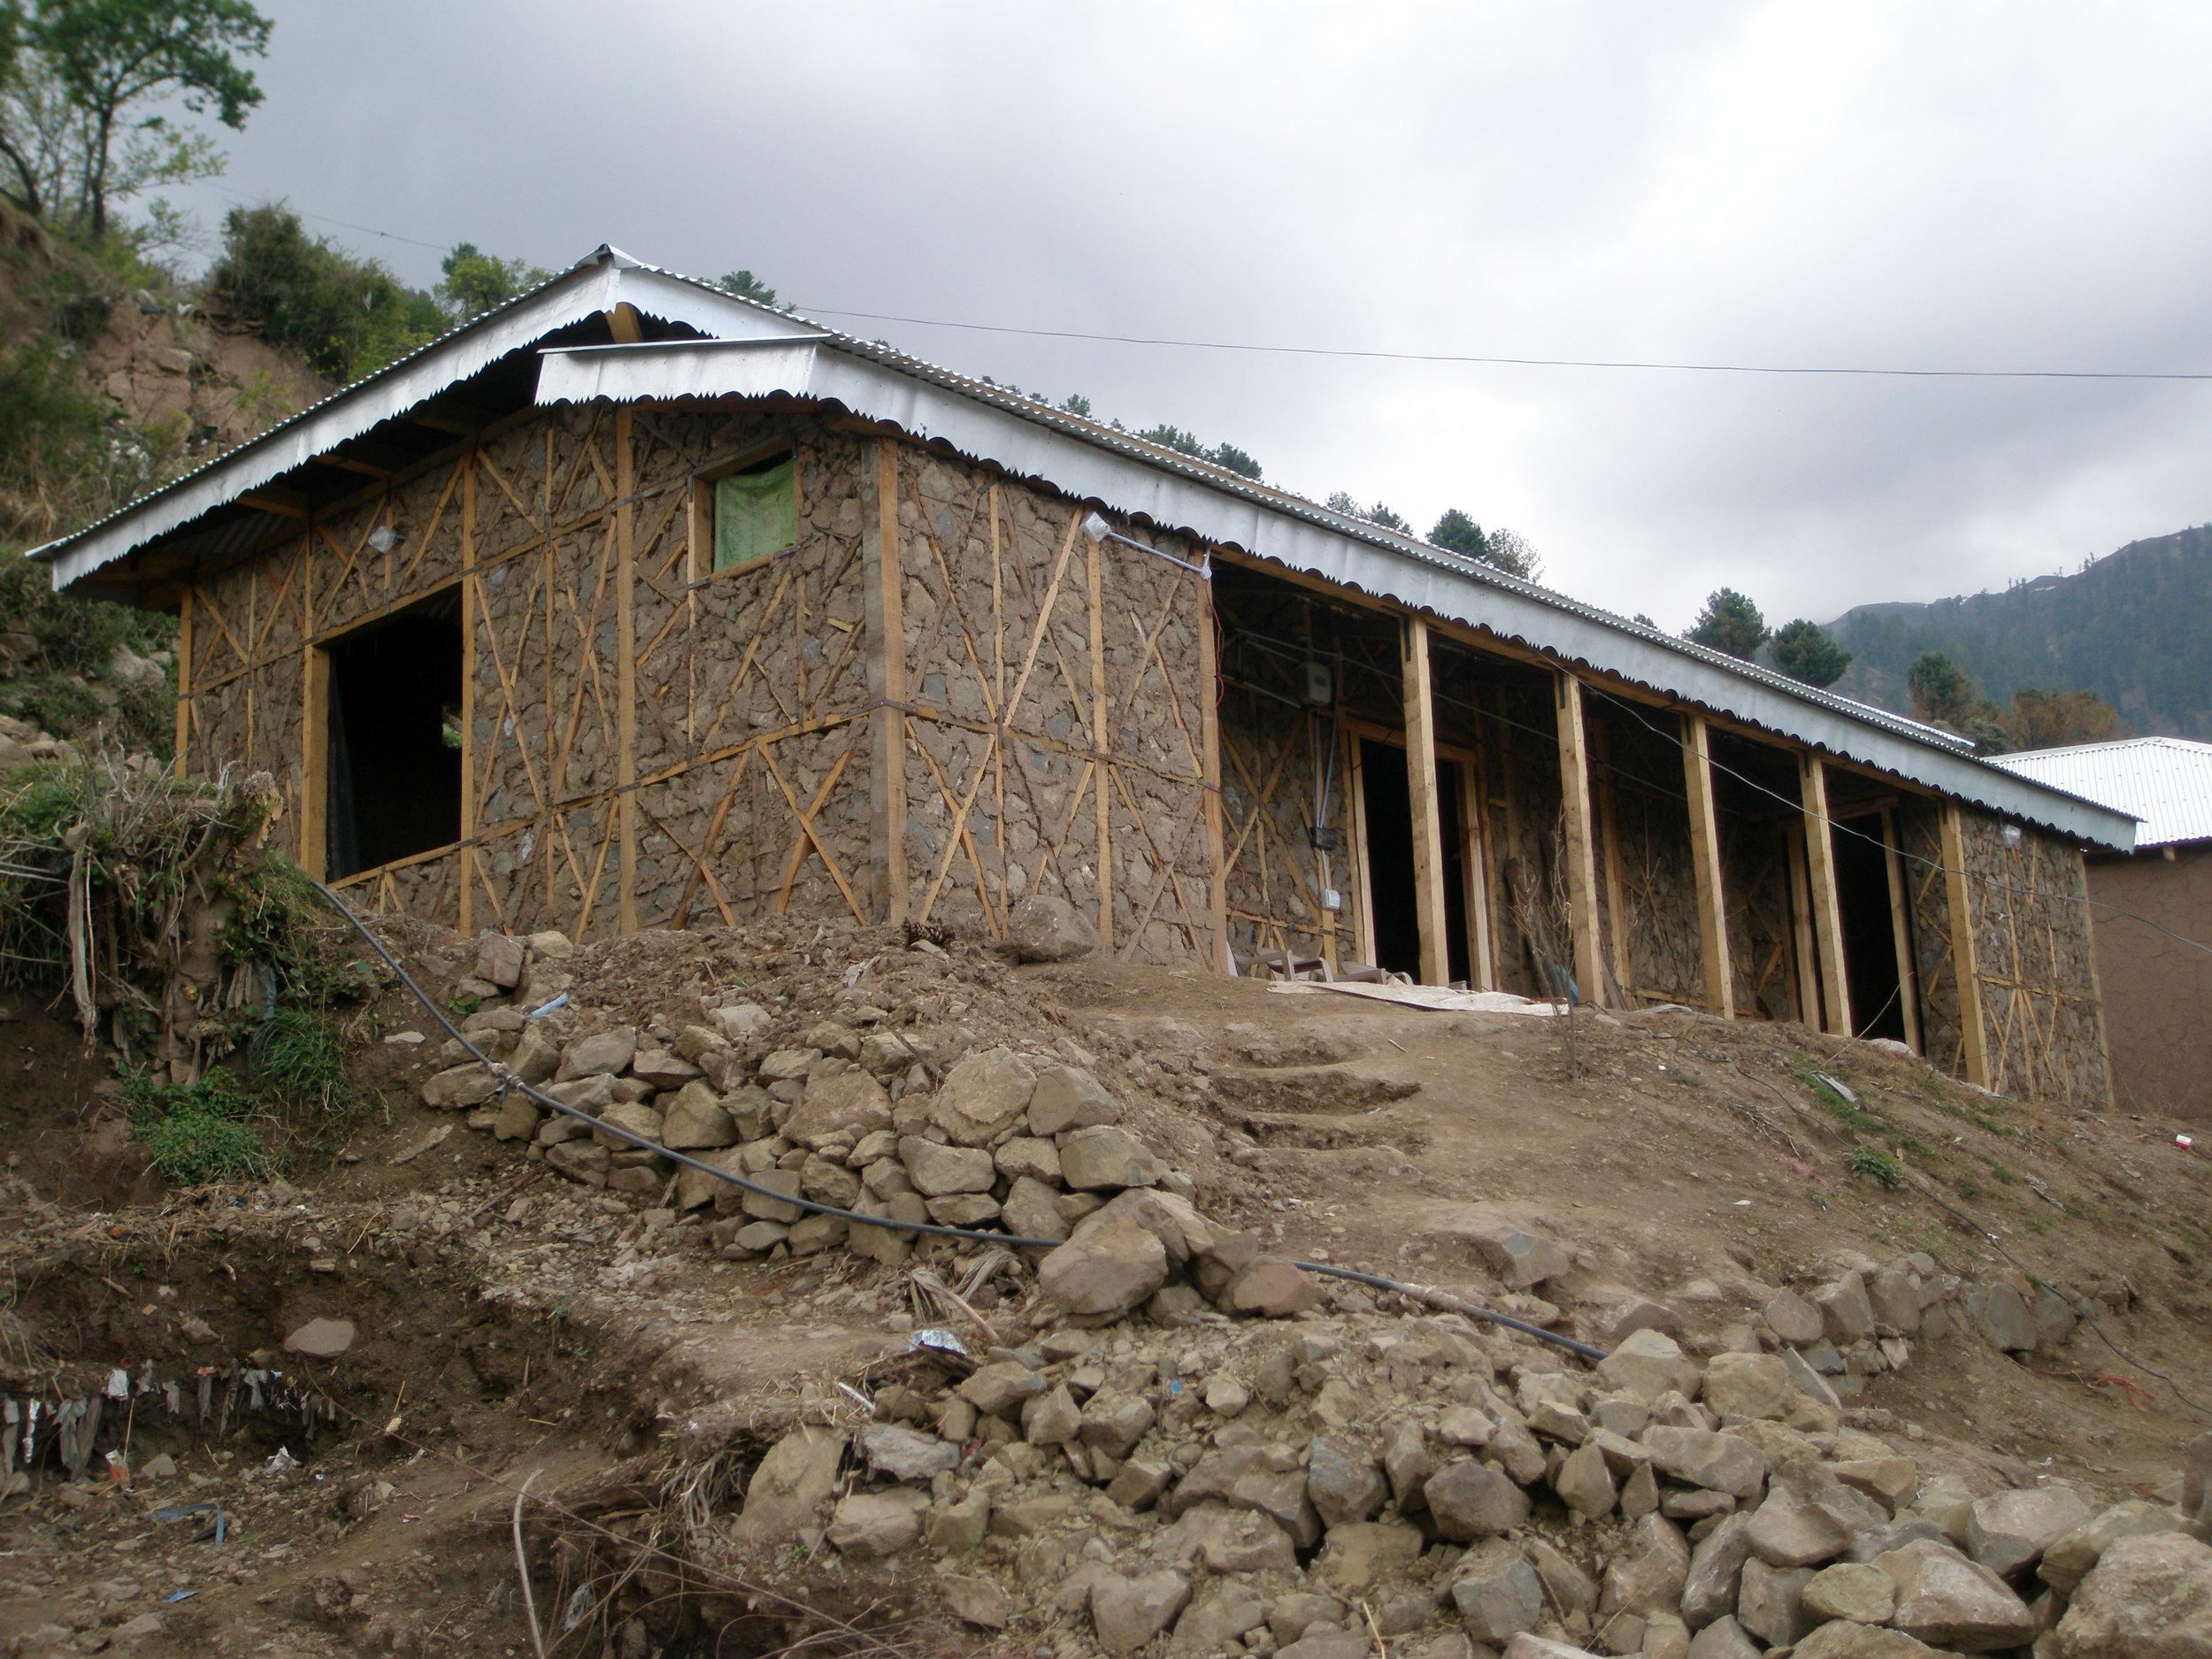 Pakistan Housing_5.jpg